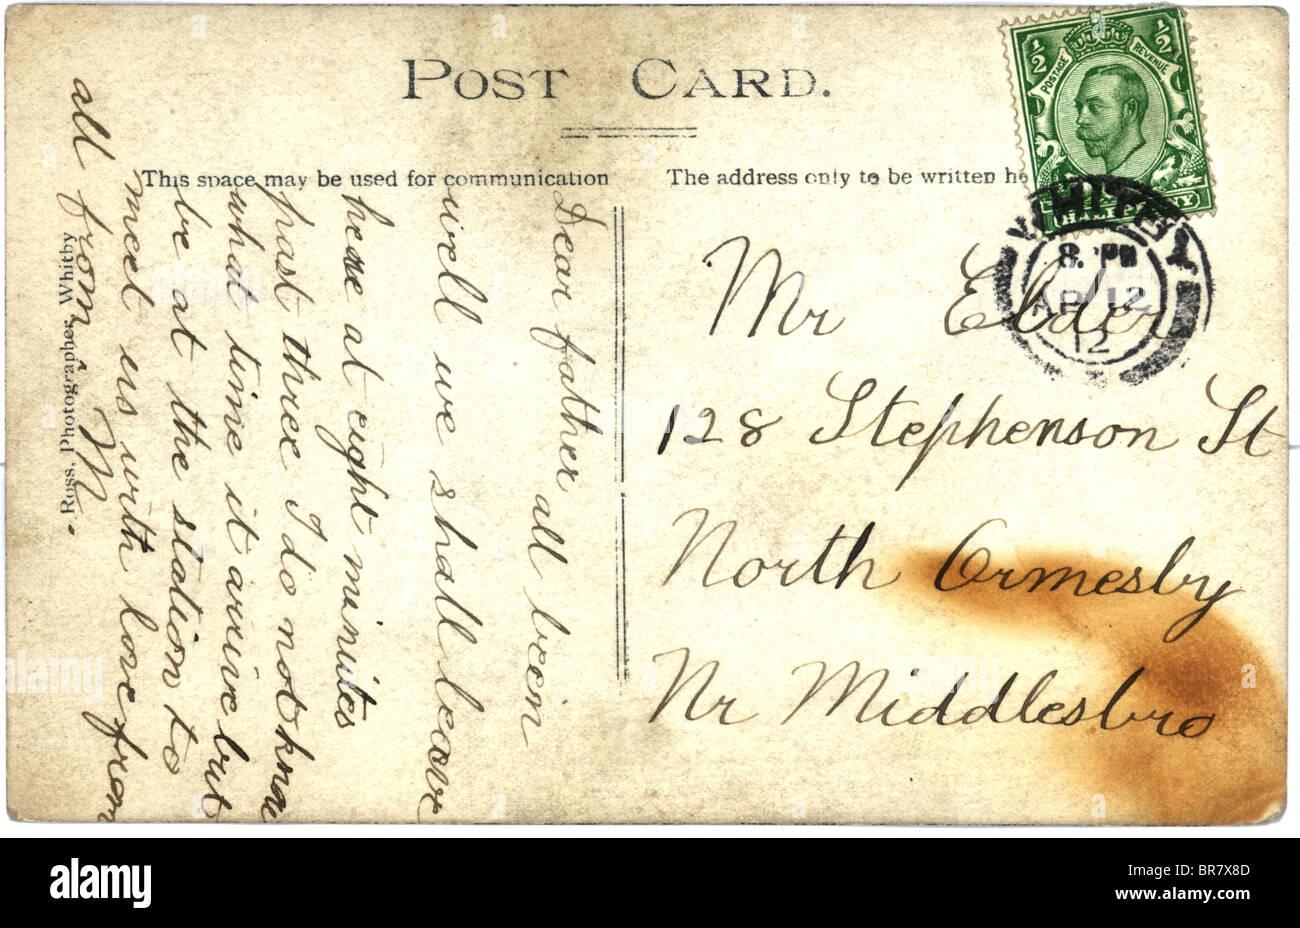 Vintage Postcard With Script Writing UK